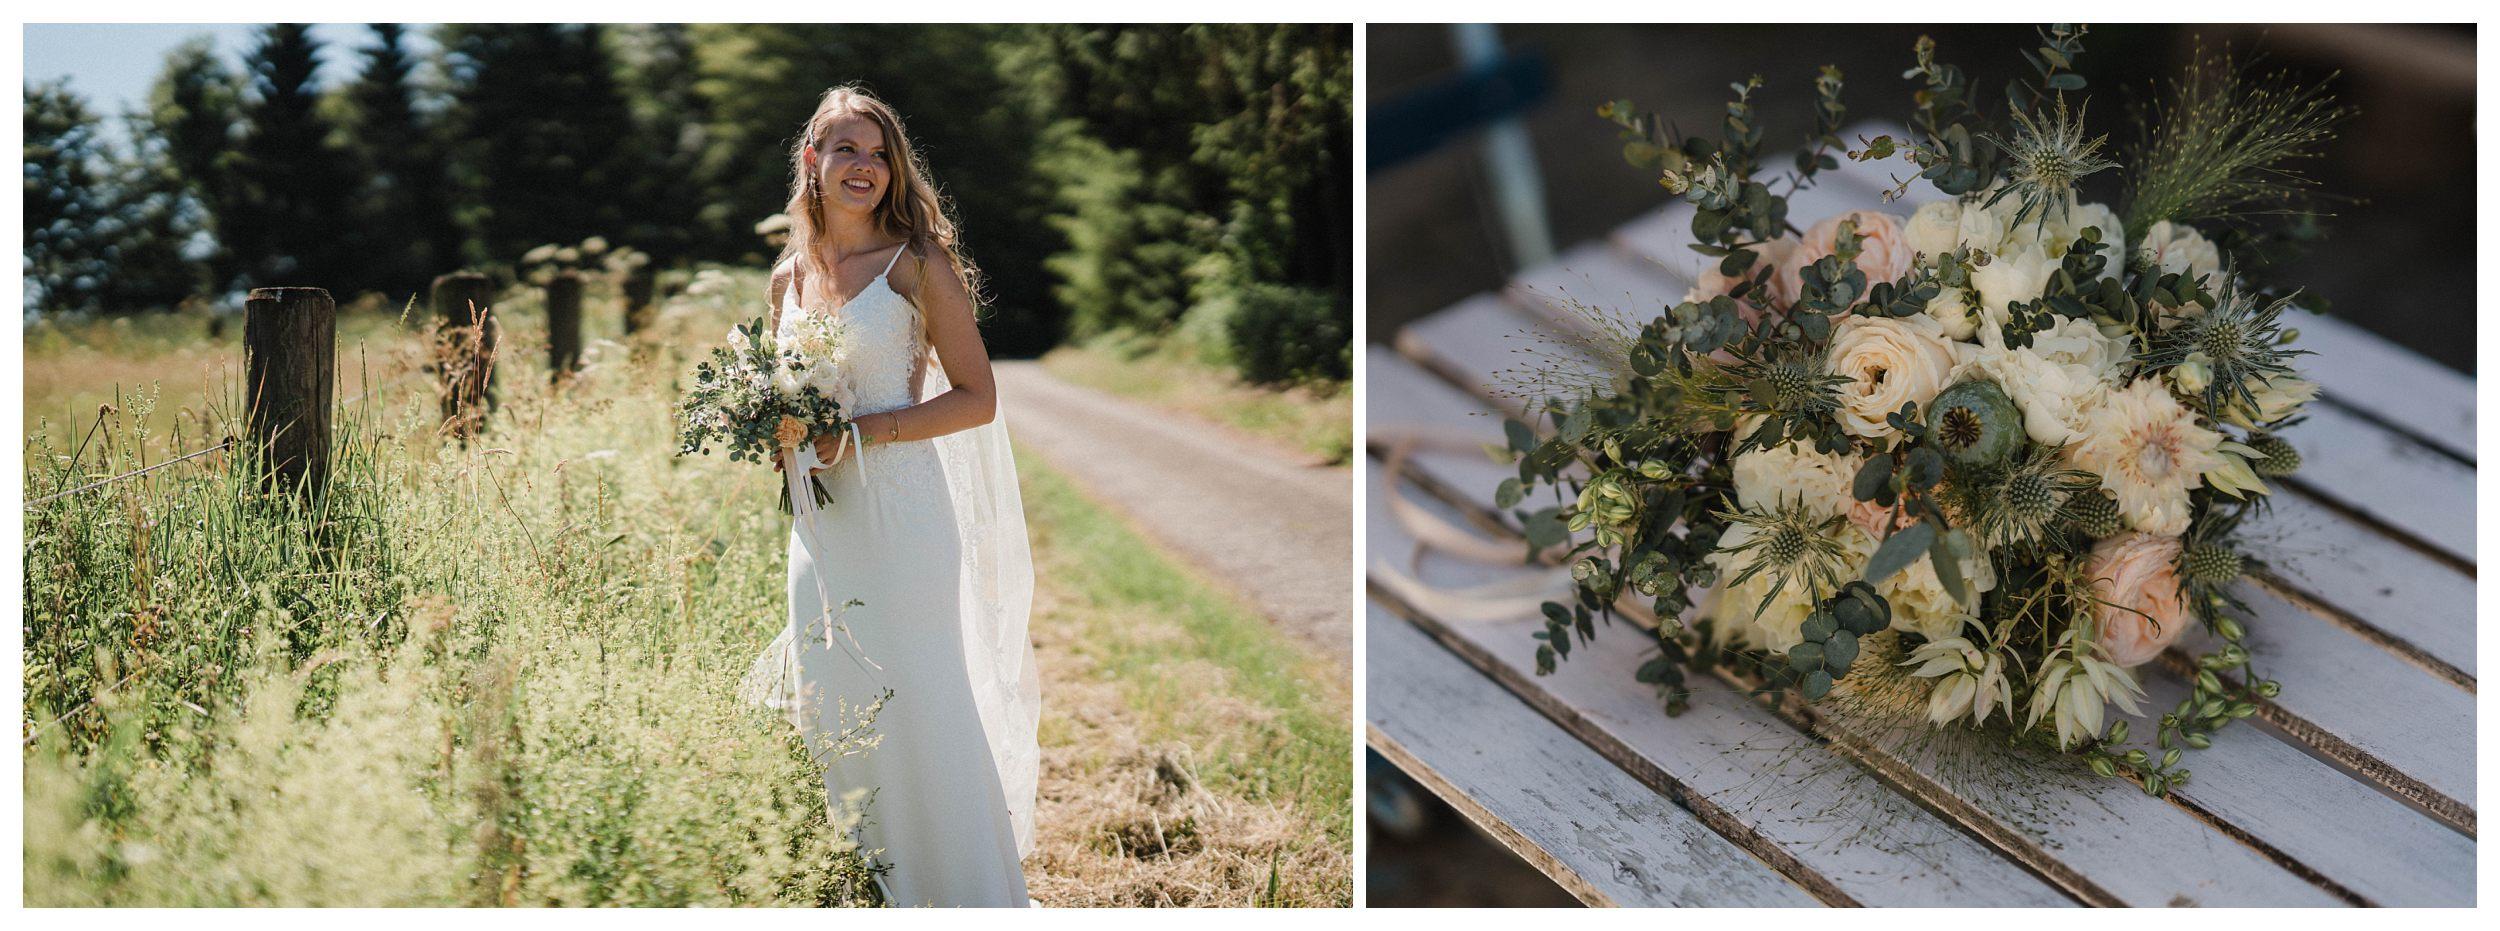 huwelijksfotograaf bruidsfotograaf destinationwedding huwelijksfotografie in ardennen nederland (51).jpg